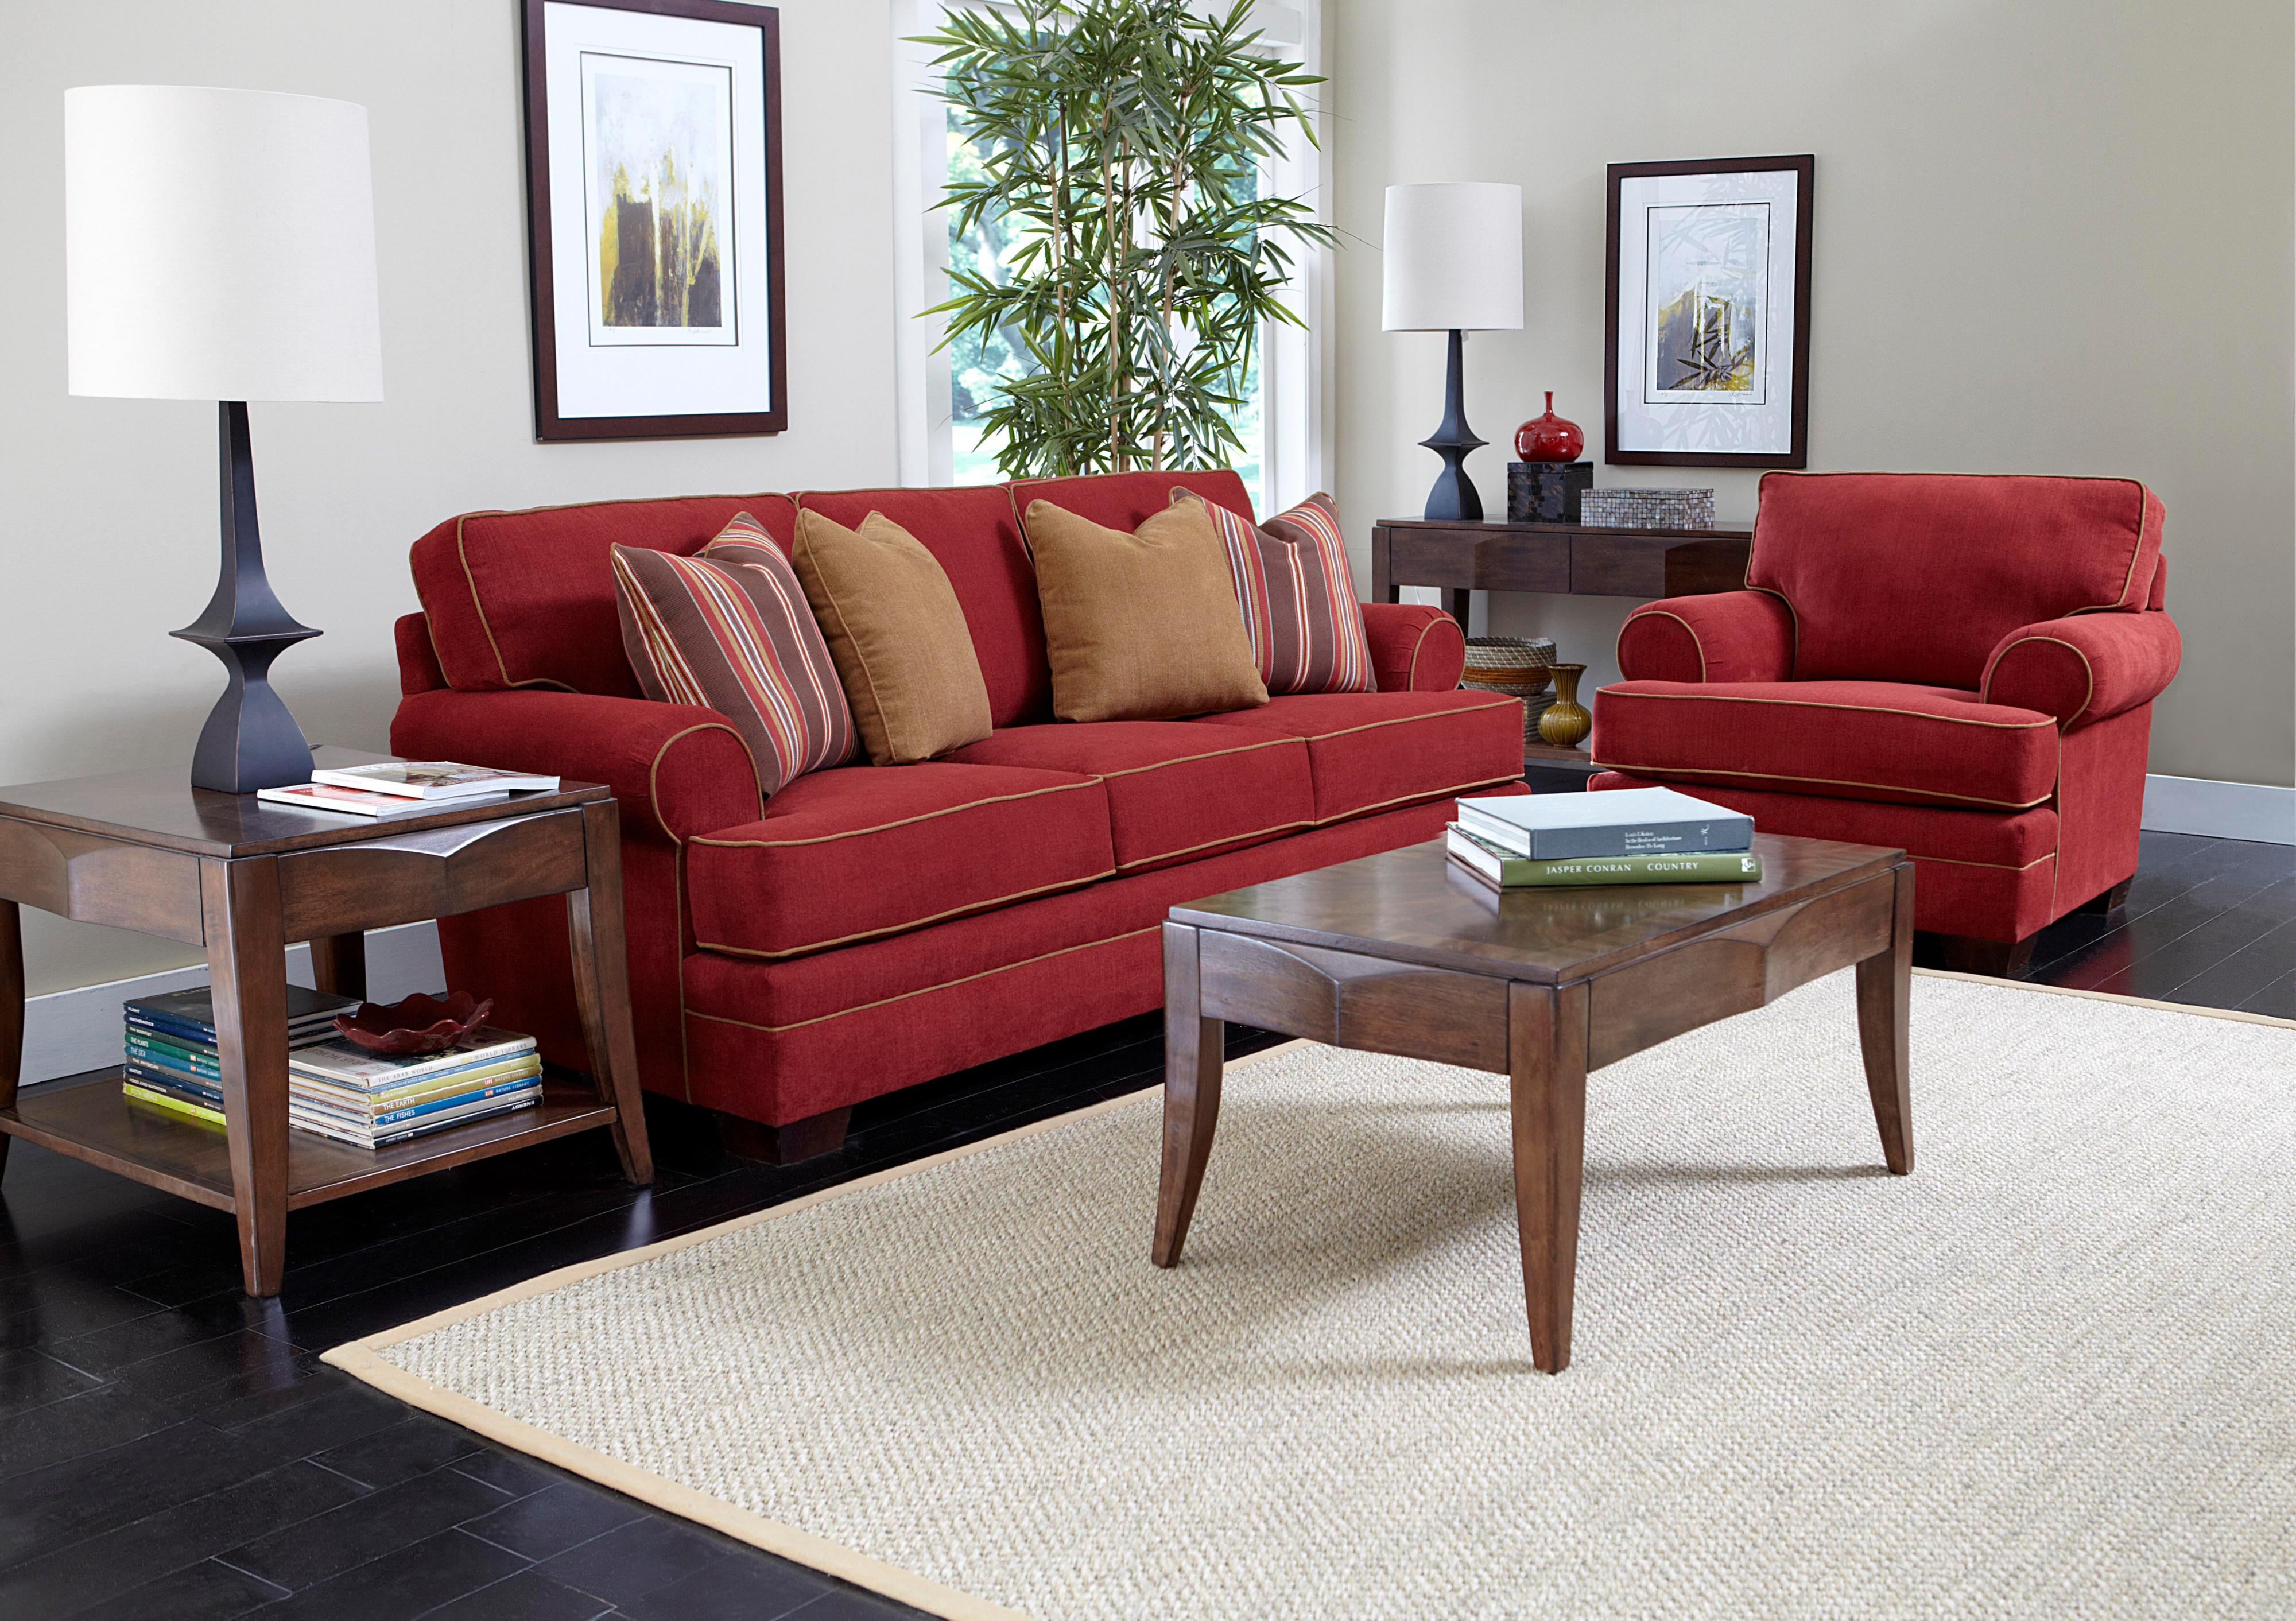 Broyhill Furniture Landon Stationary Living Room Group - Item Number: 6608 Living Room Group 1